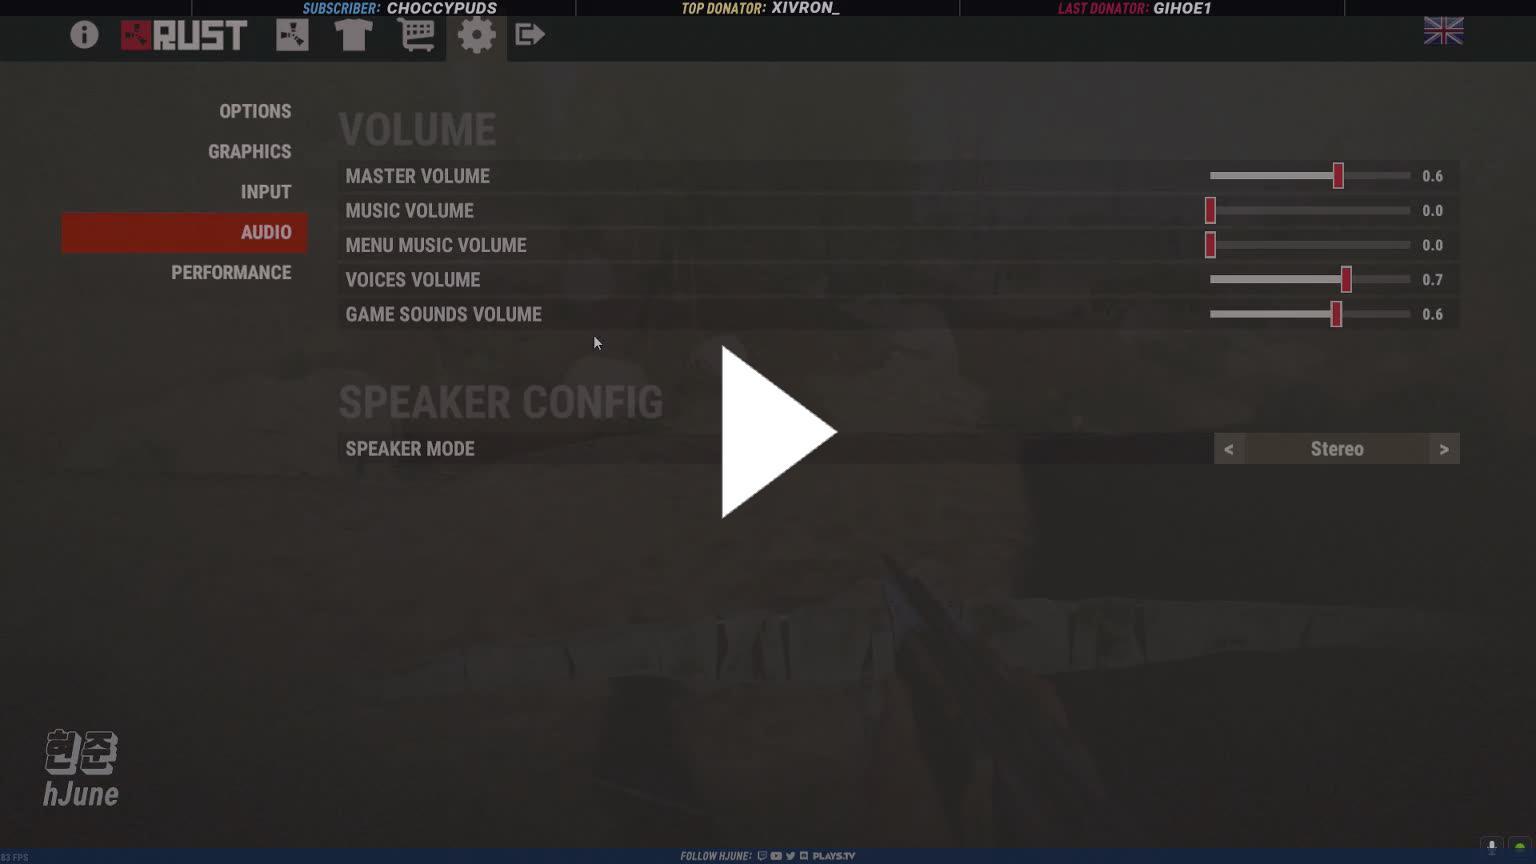 hJune - Hjune settings - Twitch